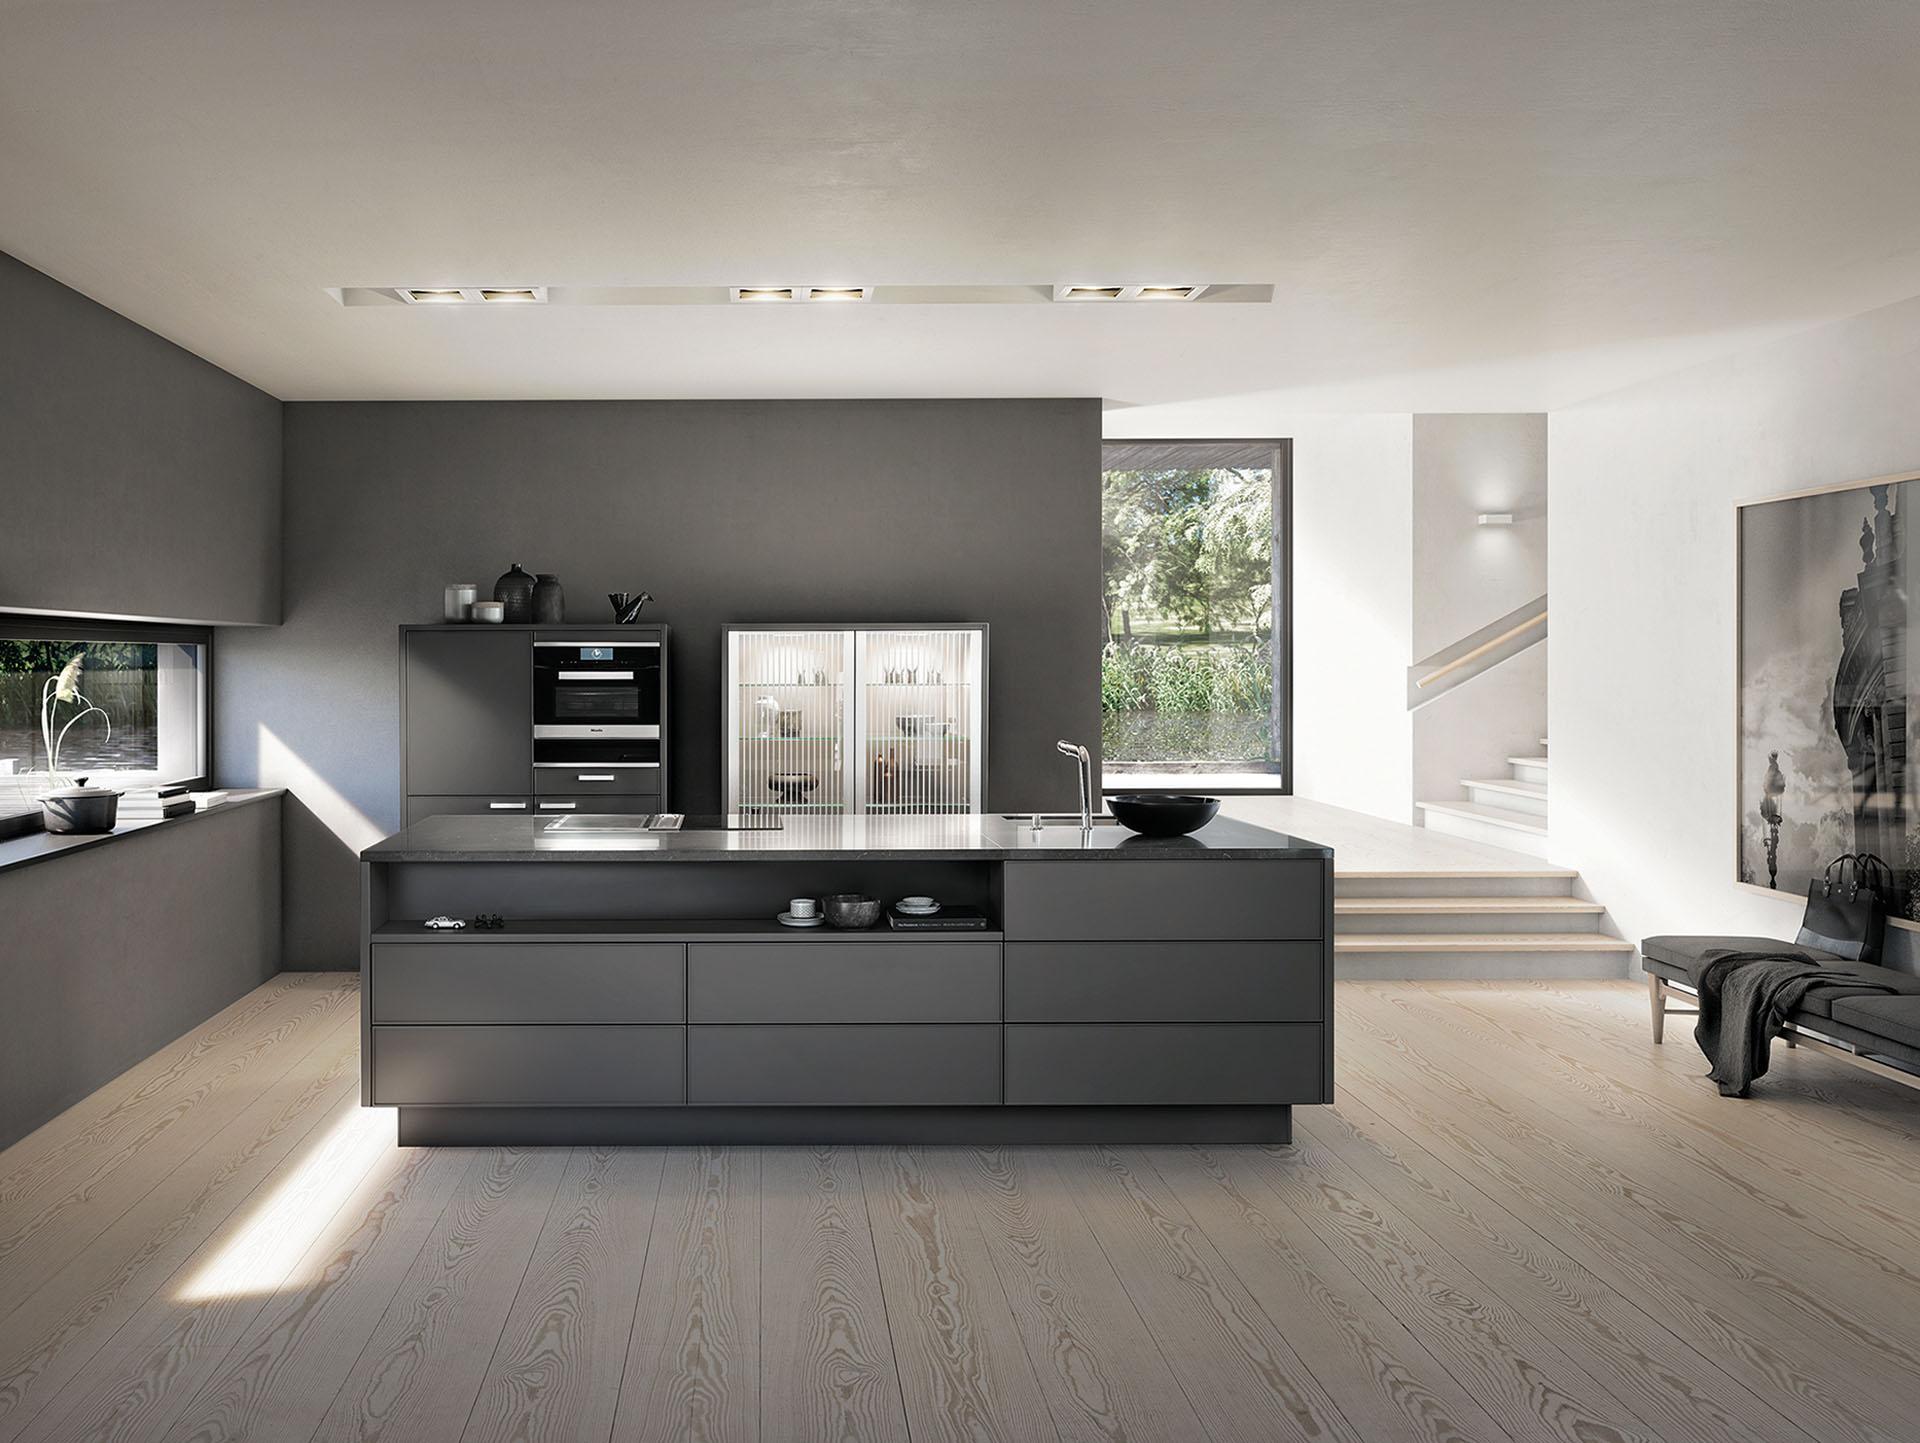 Design Keuken Showroom : Design keukens nieuwe keuken kopen aswa keukens